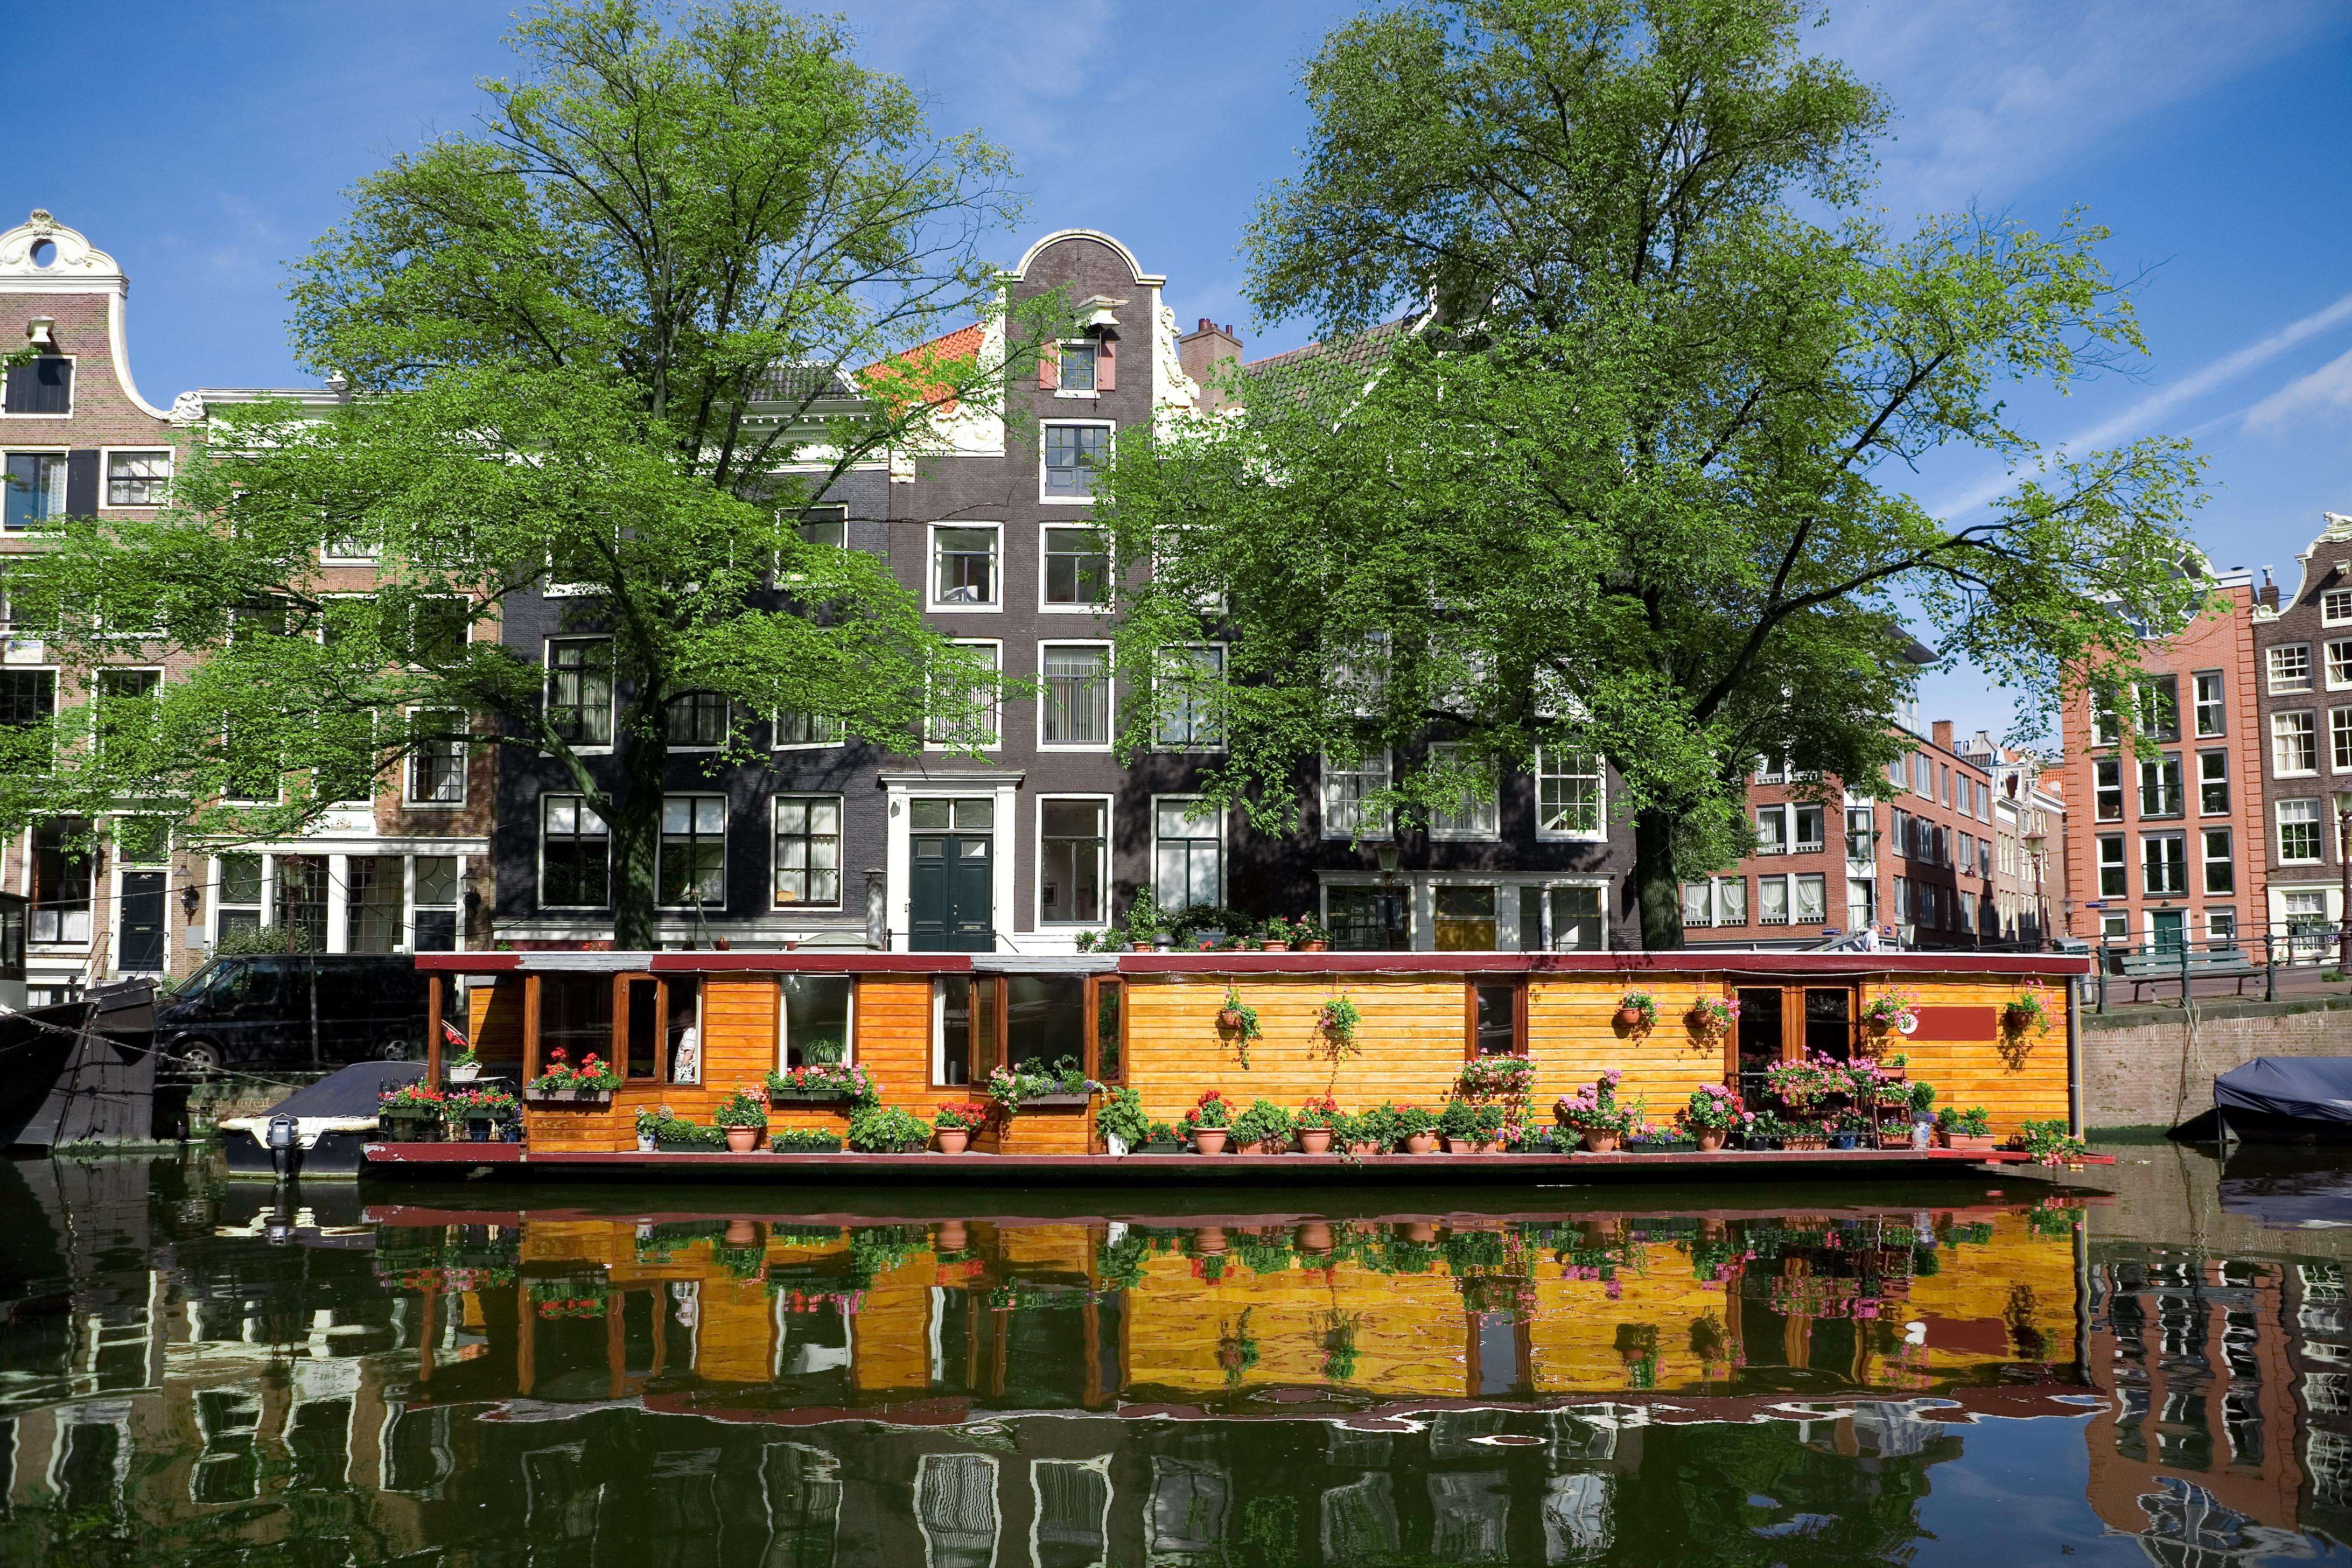 Las casas flotantes de Ámsterdam - Holanda Circuito Escápate a Ámsterdam